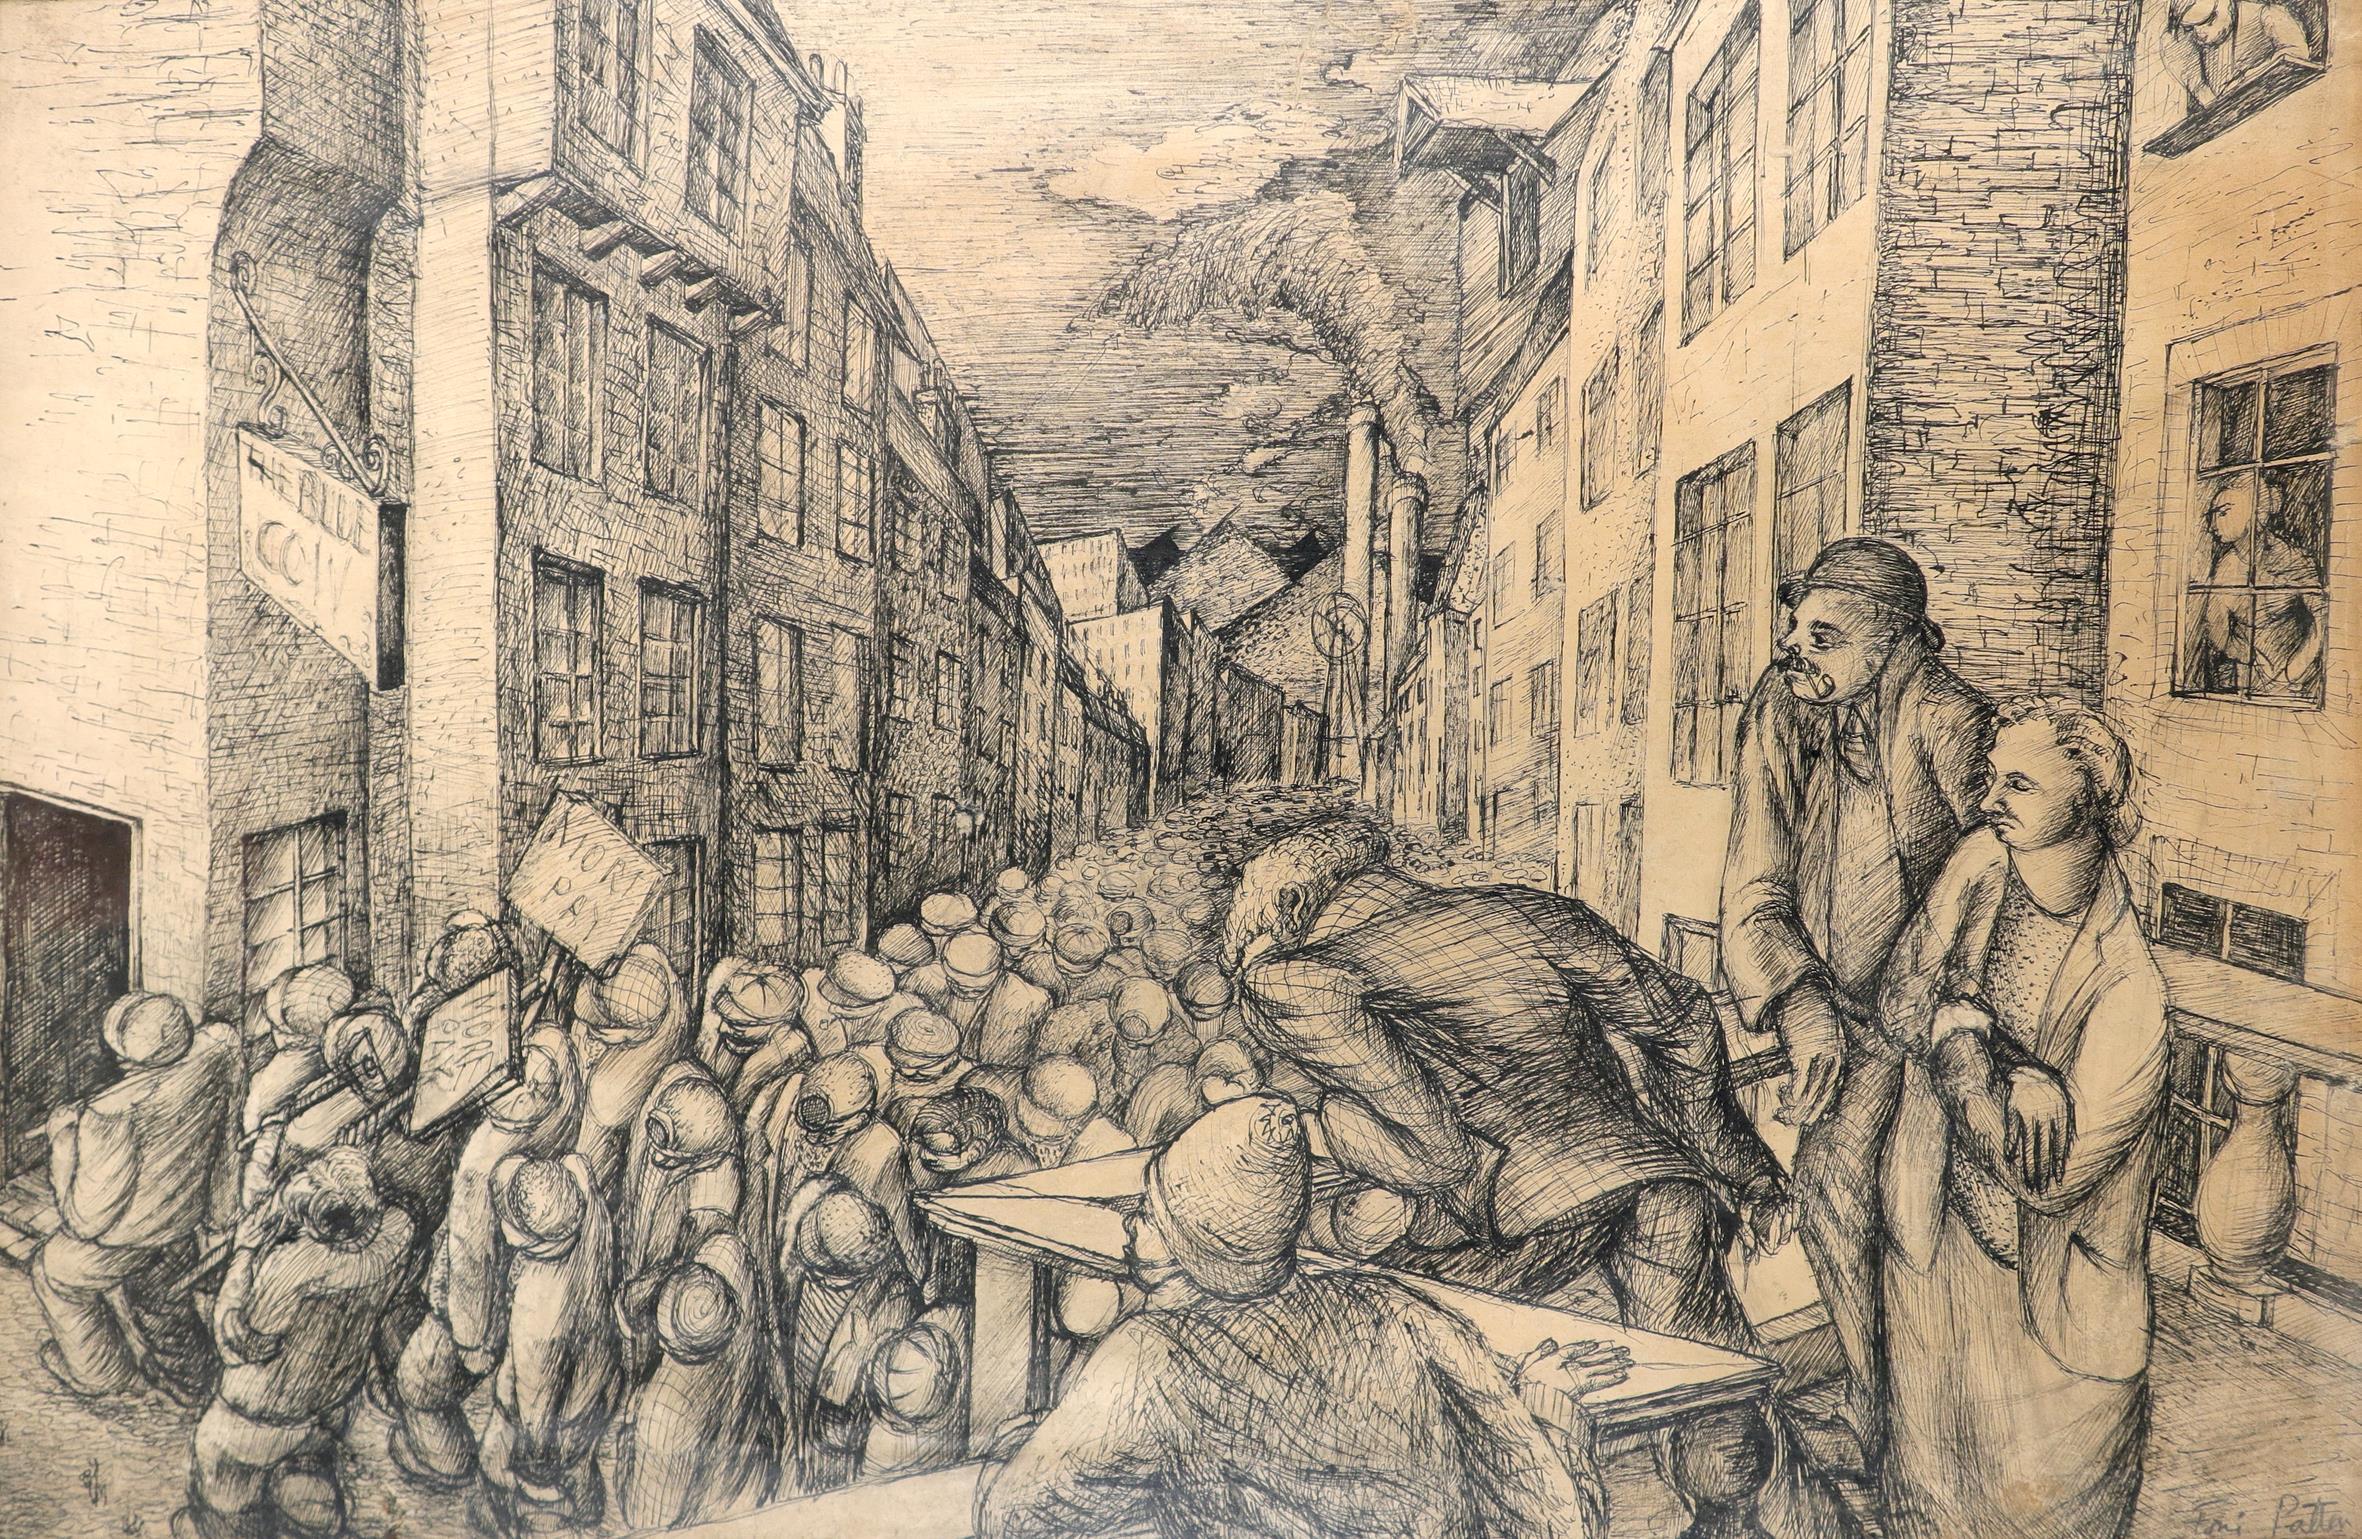 ‡Toni Patten (20th Century) Striking workers Signed Toni Patten (lower right) Pen 34.4 x 54.7cm